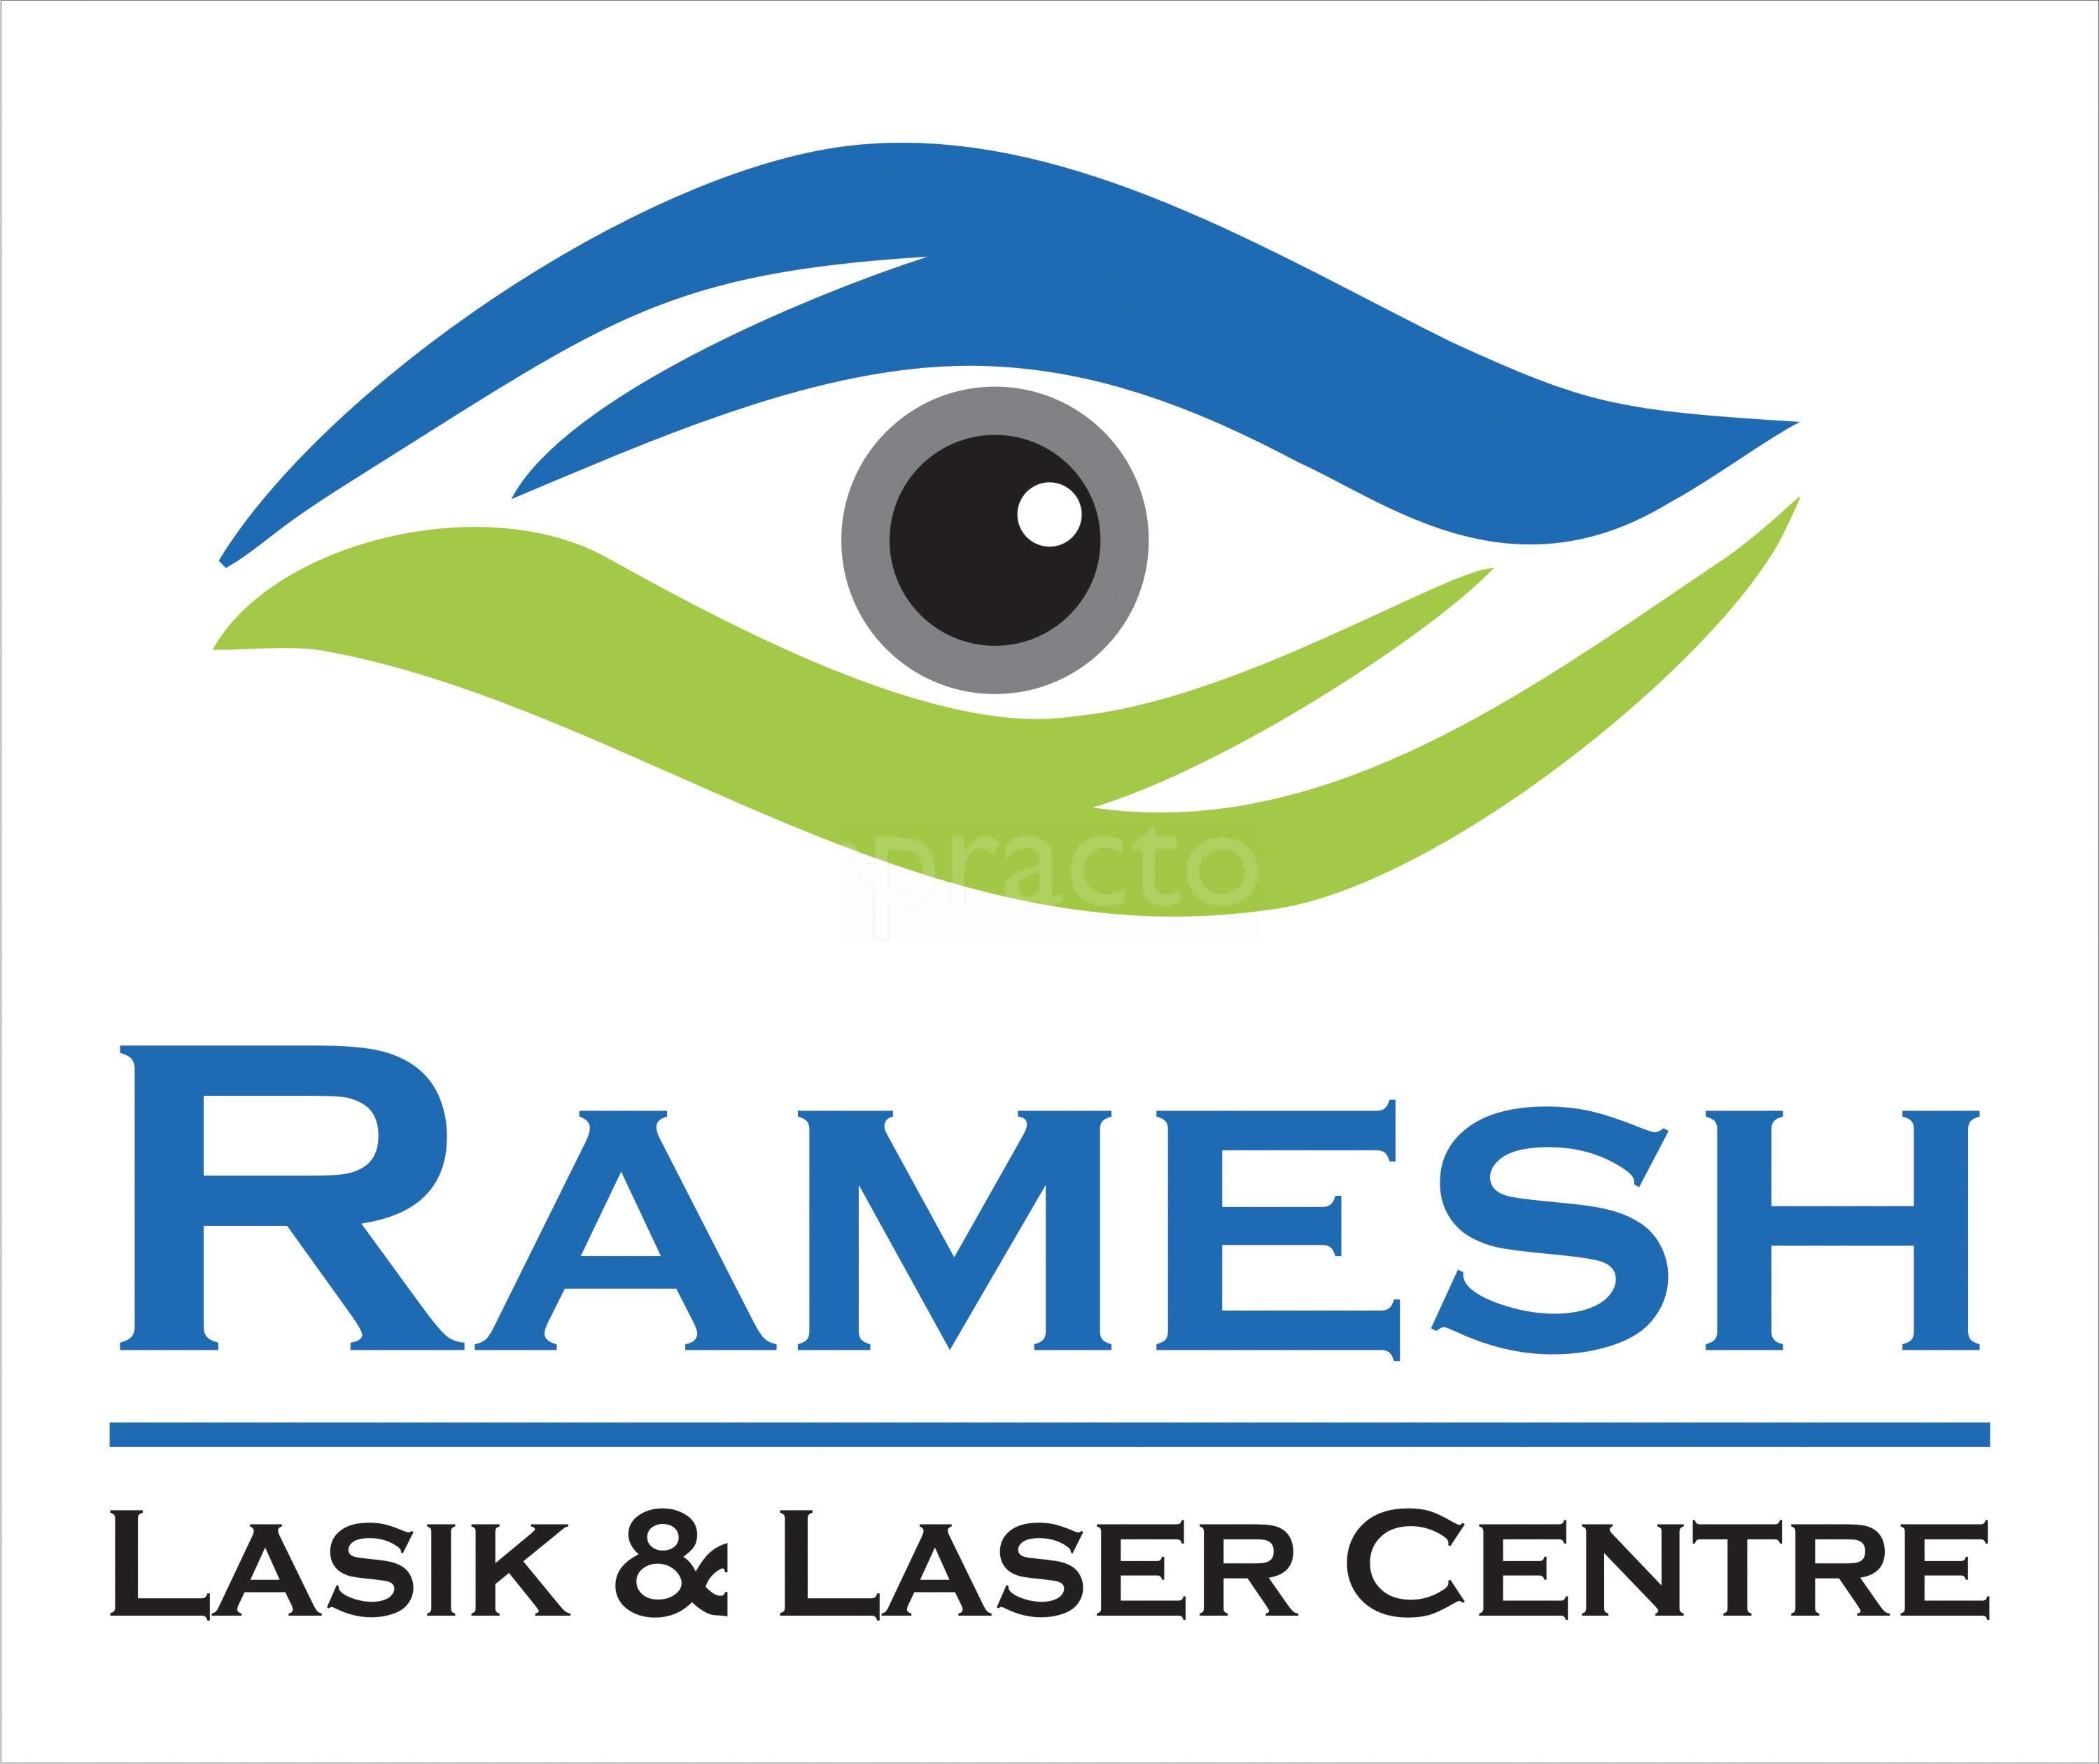 Ramesh Lasik & Laser Centre